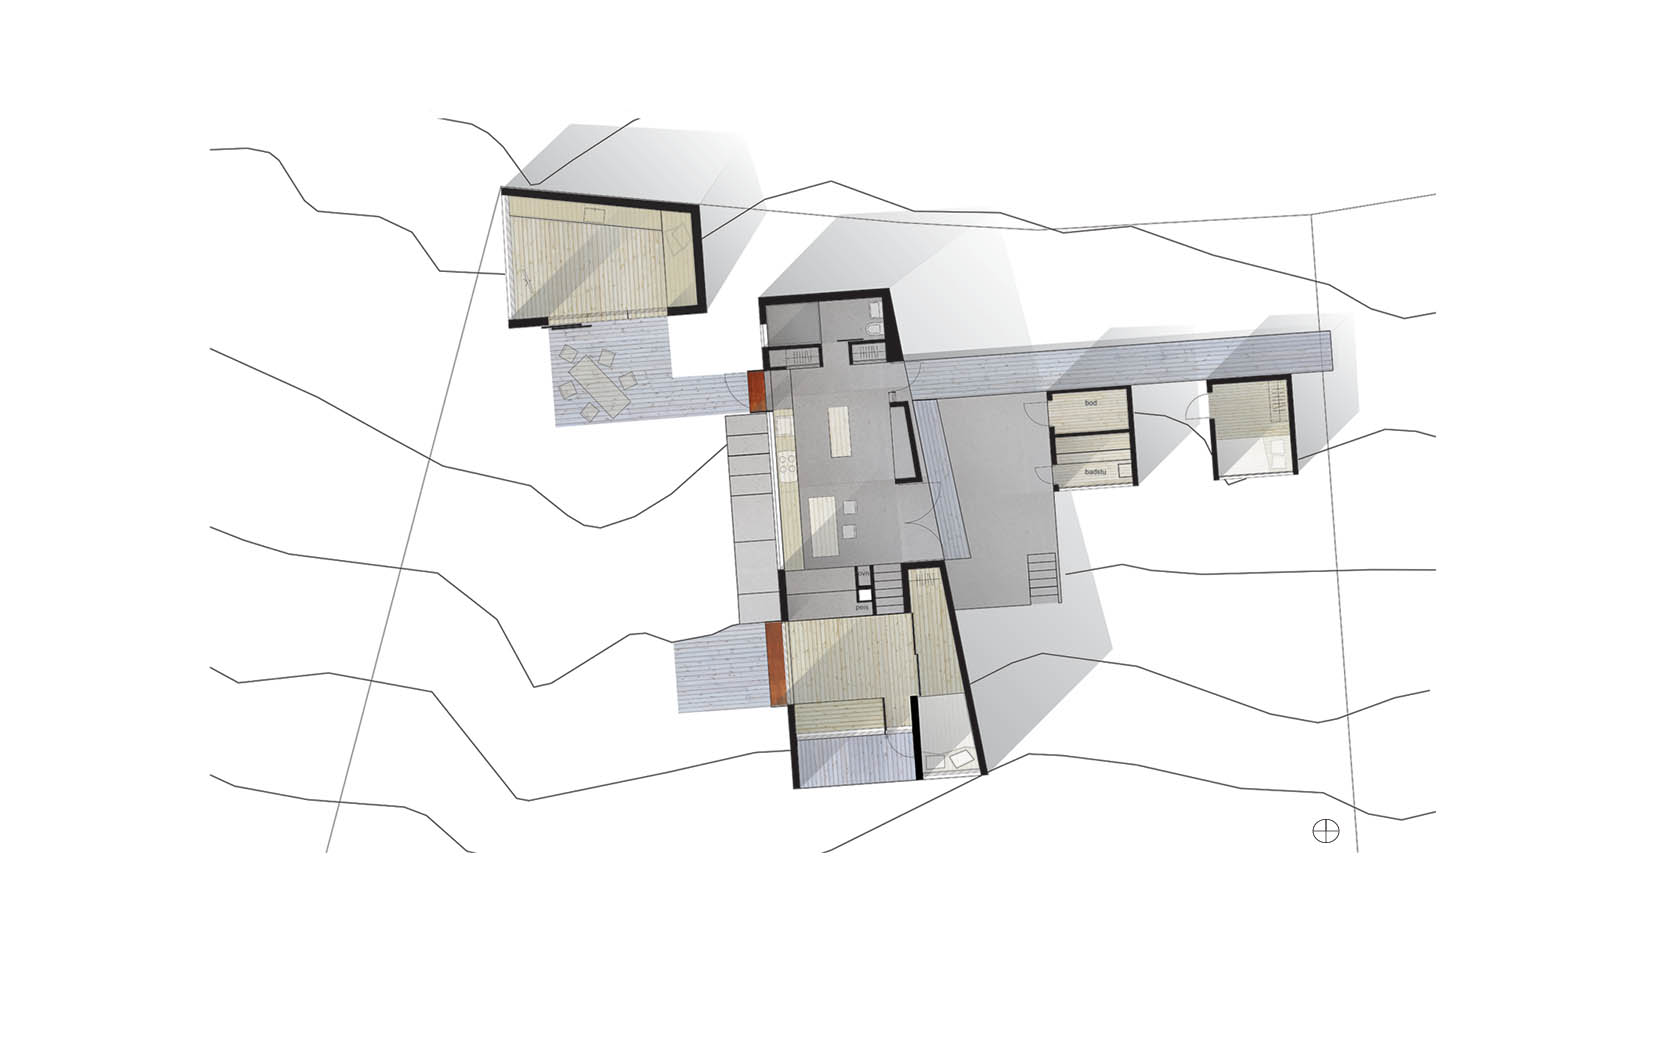 plan_atelierb.jpg